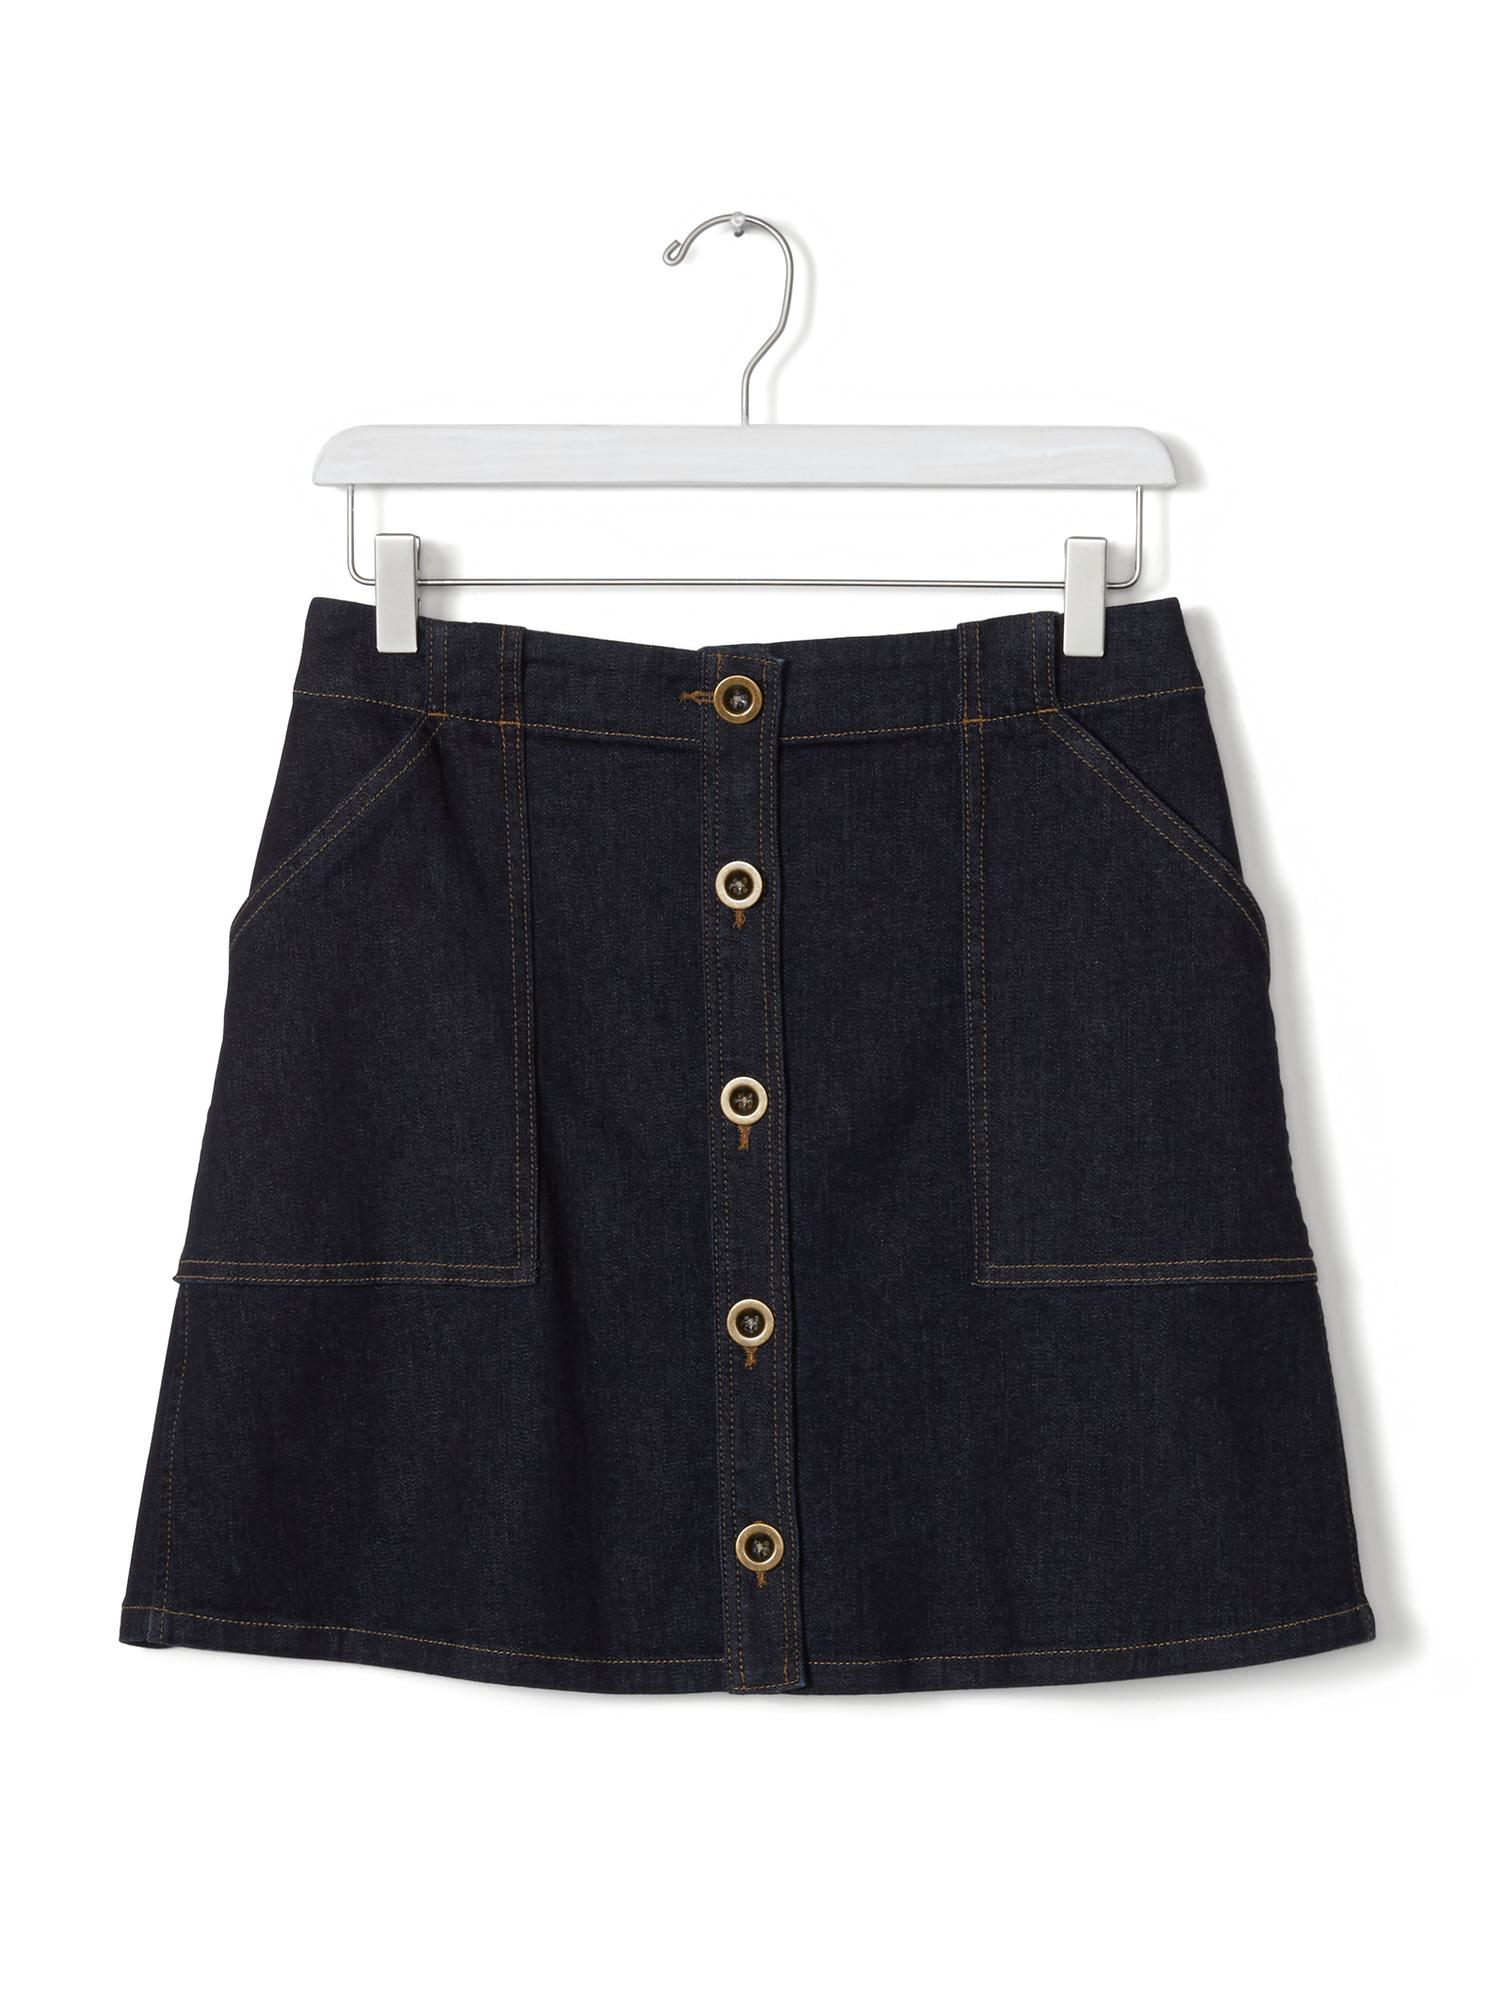 banana republic button front denim skirt in black